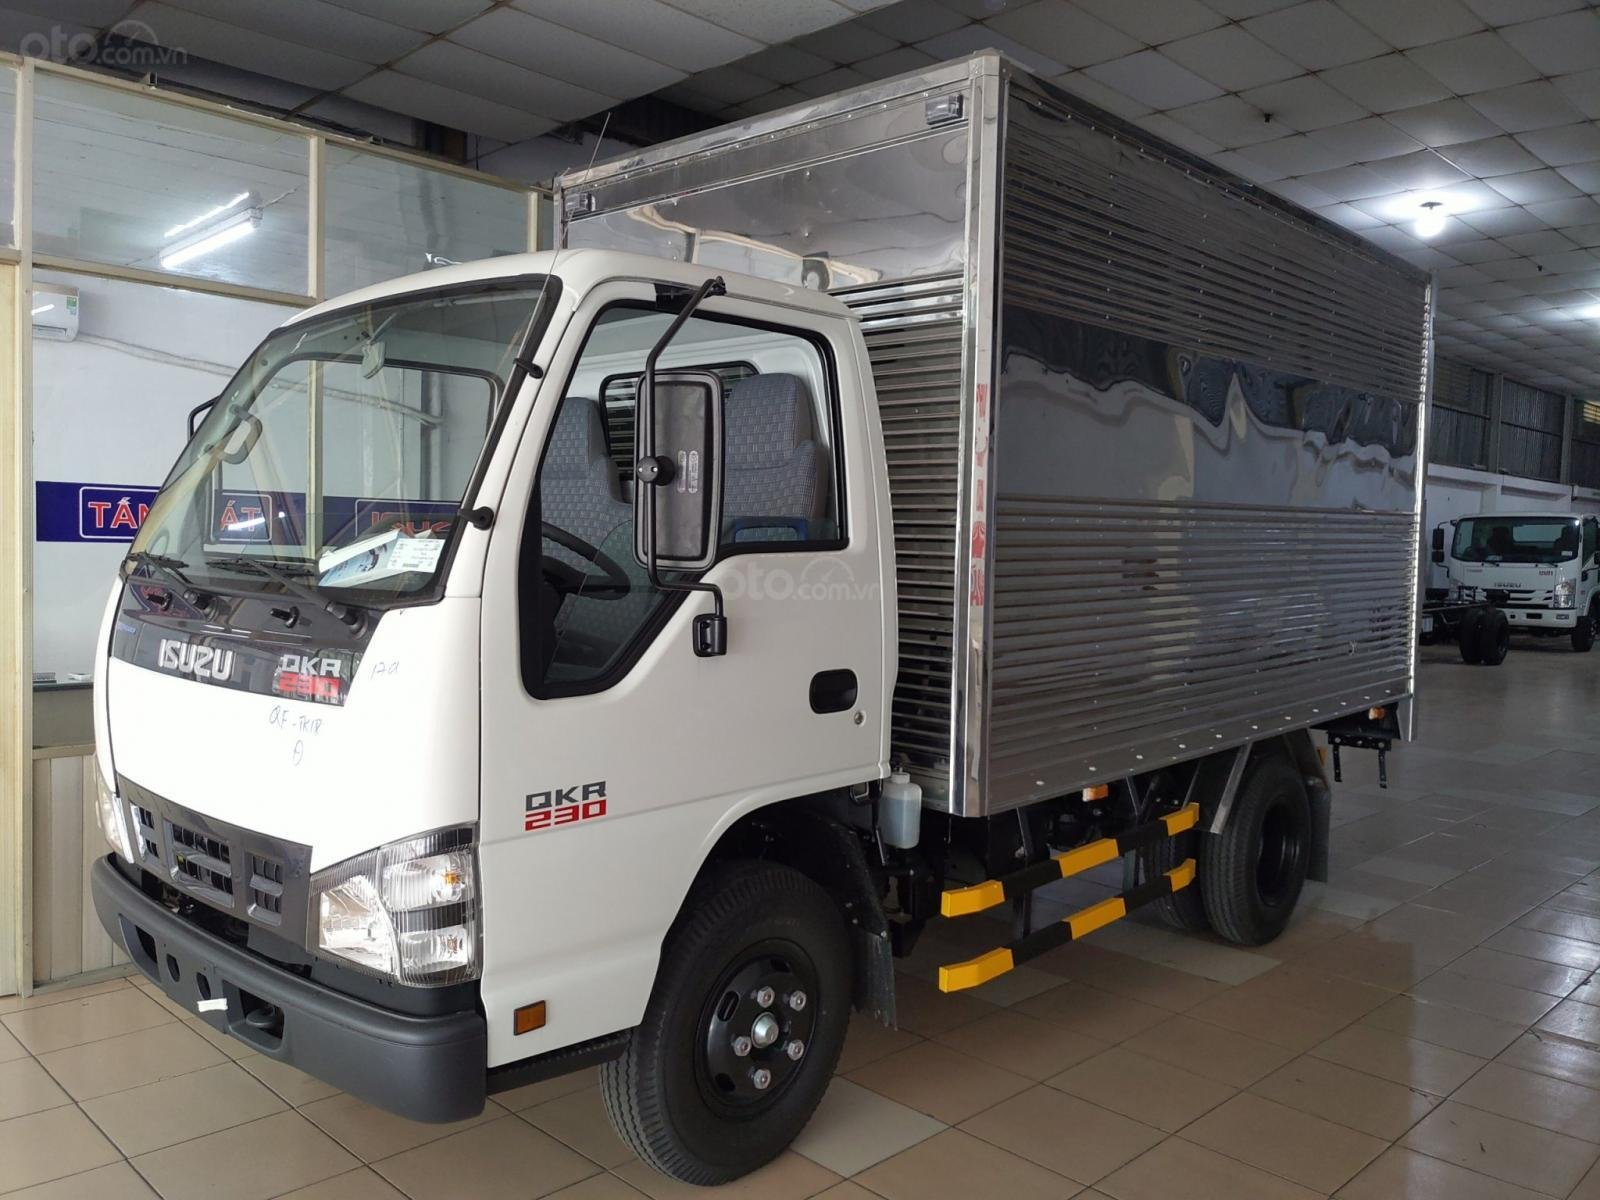 Isuzu 1.5 tấn thùng kín inox - KM: 9.4tr tiền mặt, máy lạnh, 12 phiếu bảo dưỡng, radio MP3 (1)